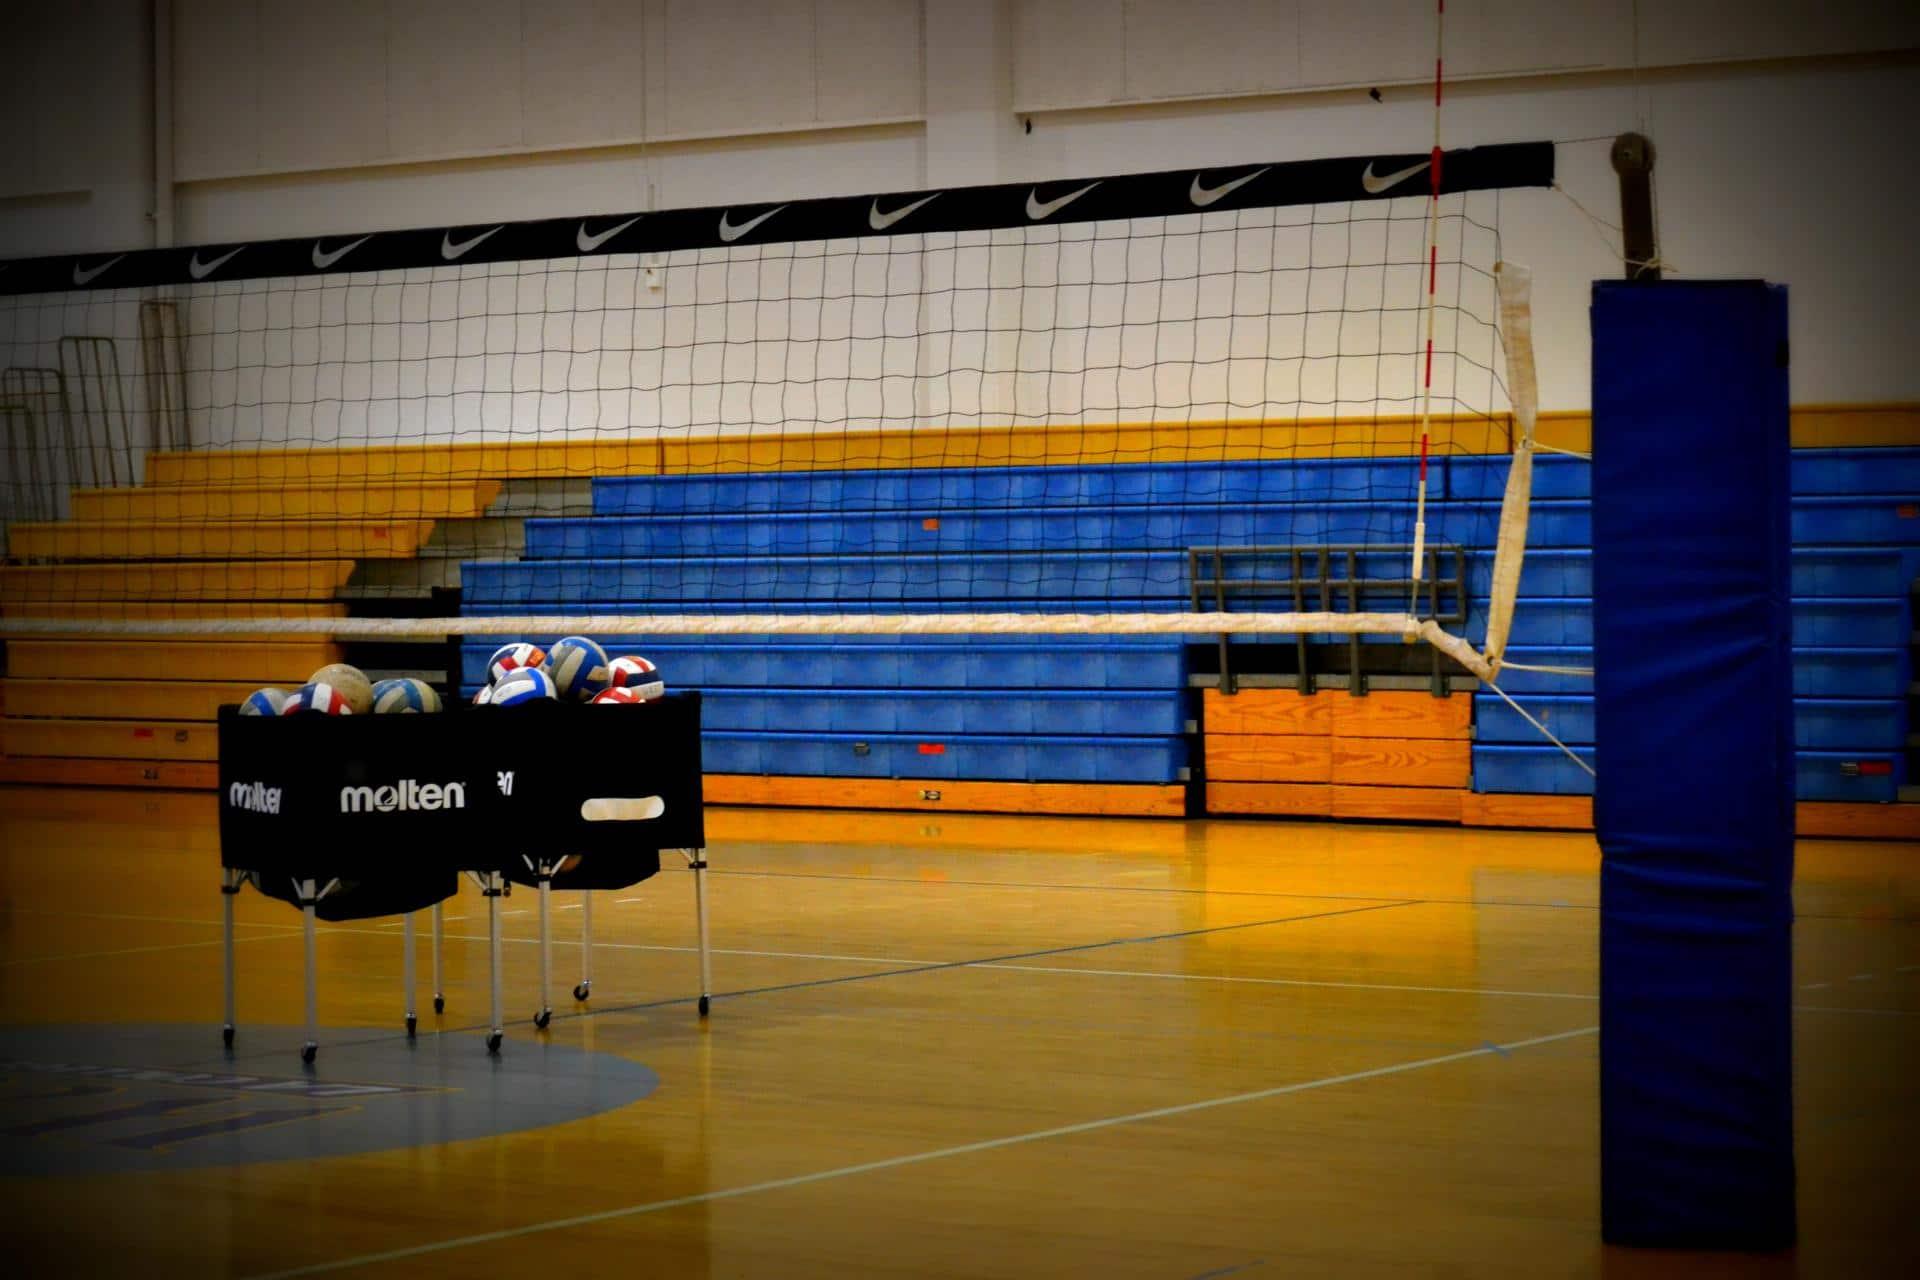 Altura dela red de voleibol para las diferentes categorias